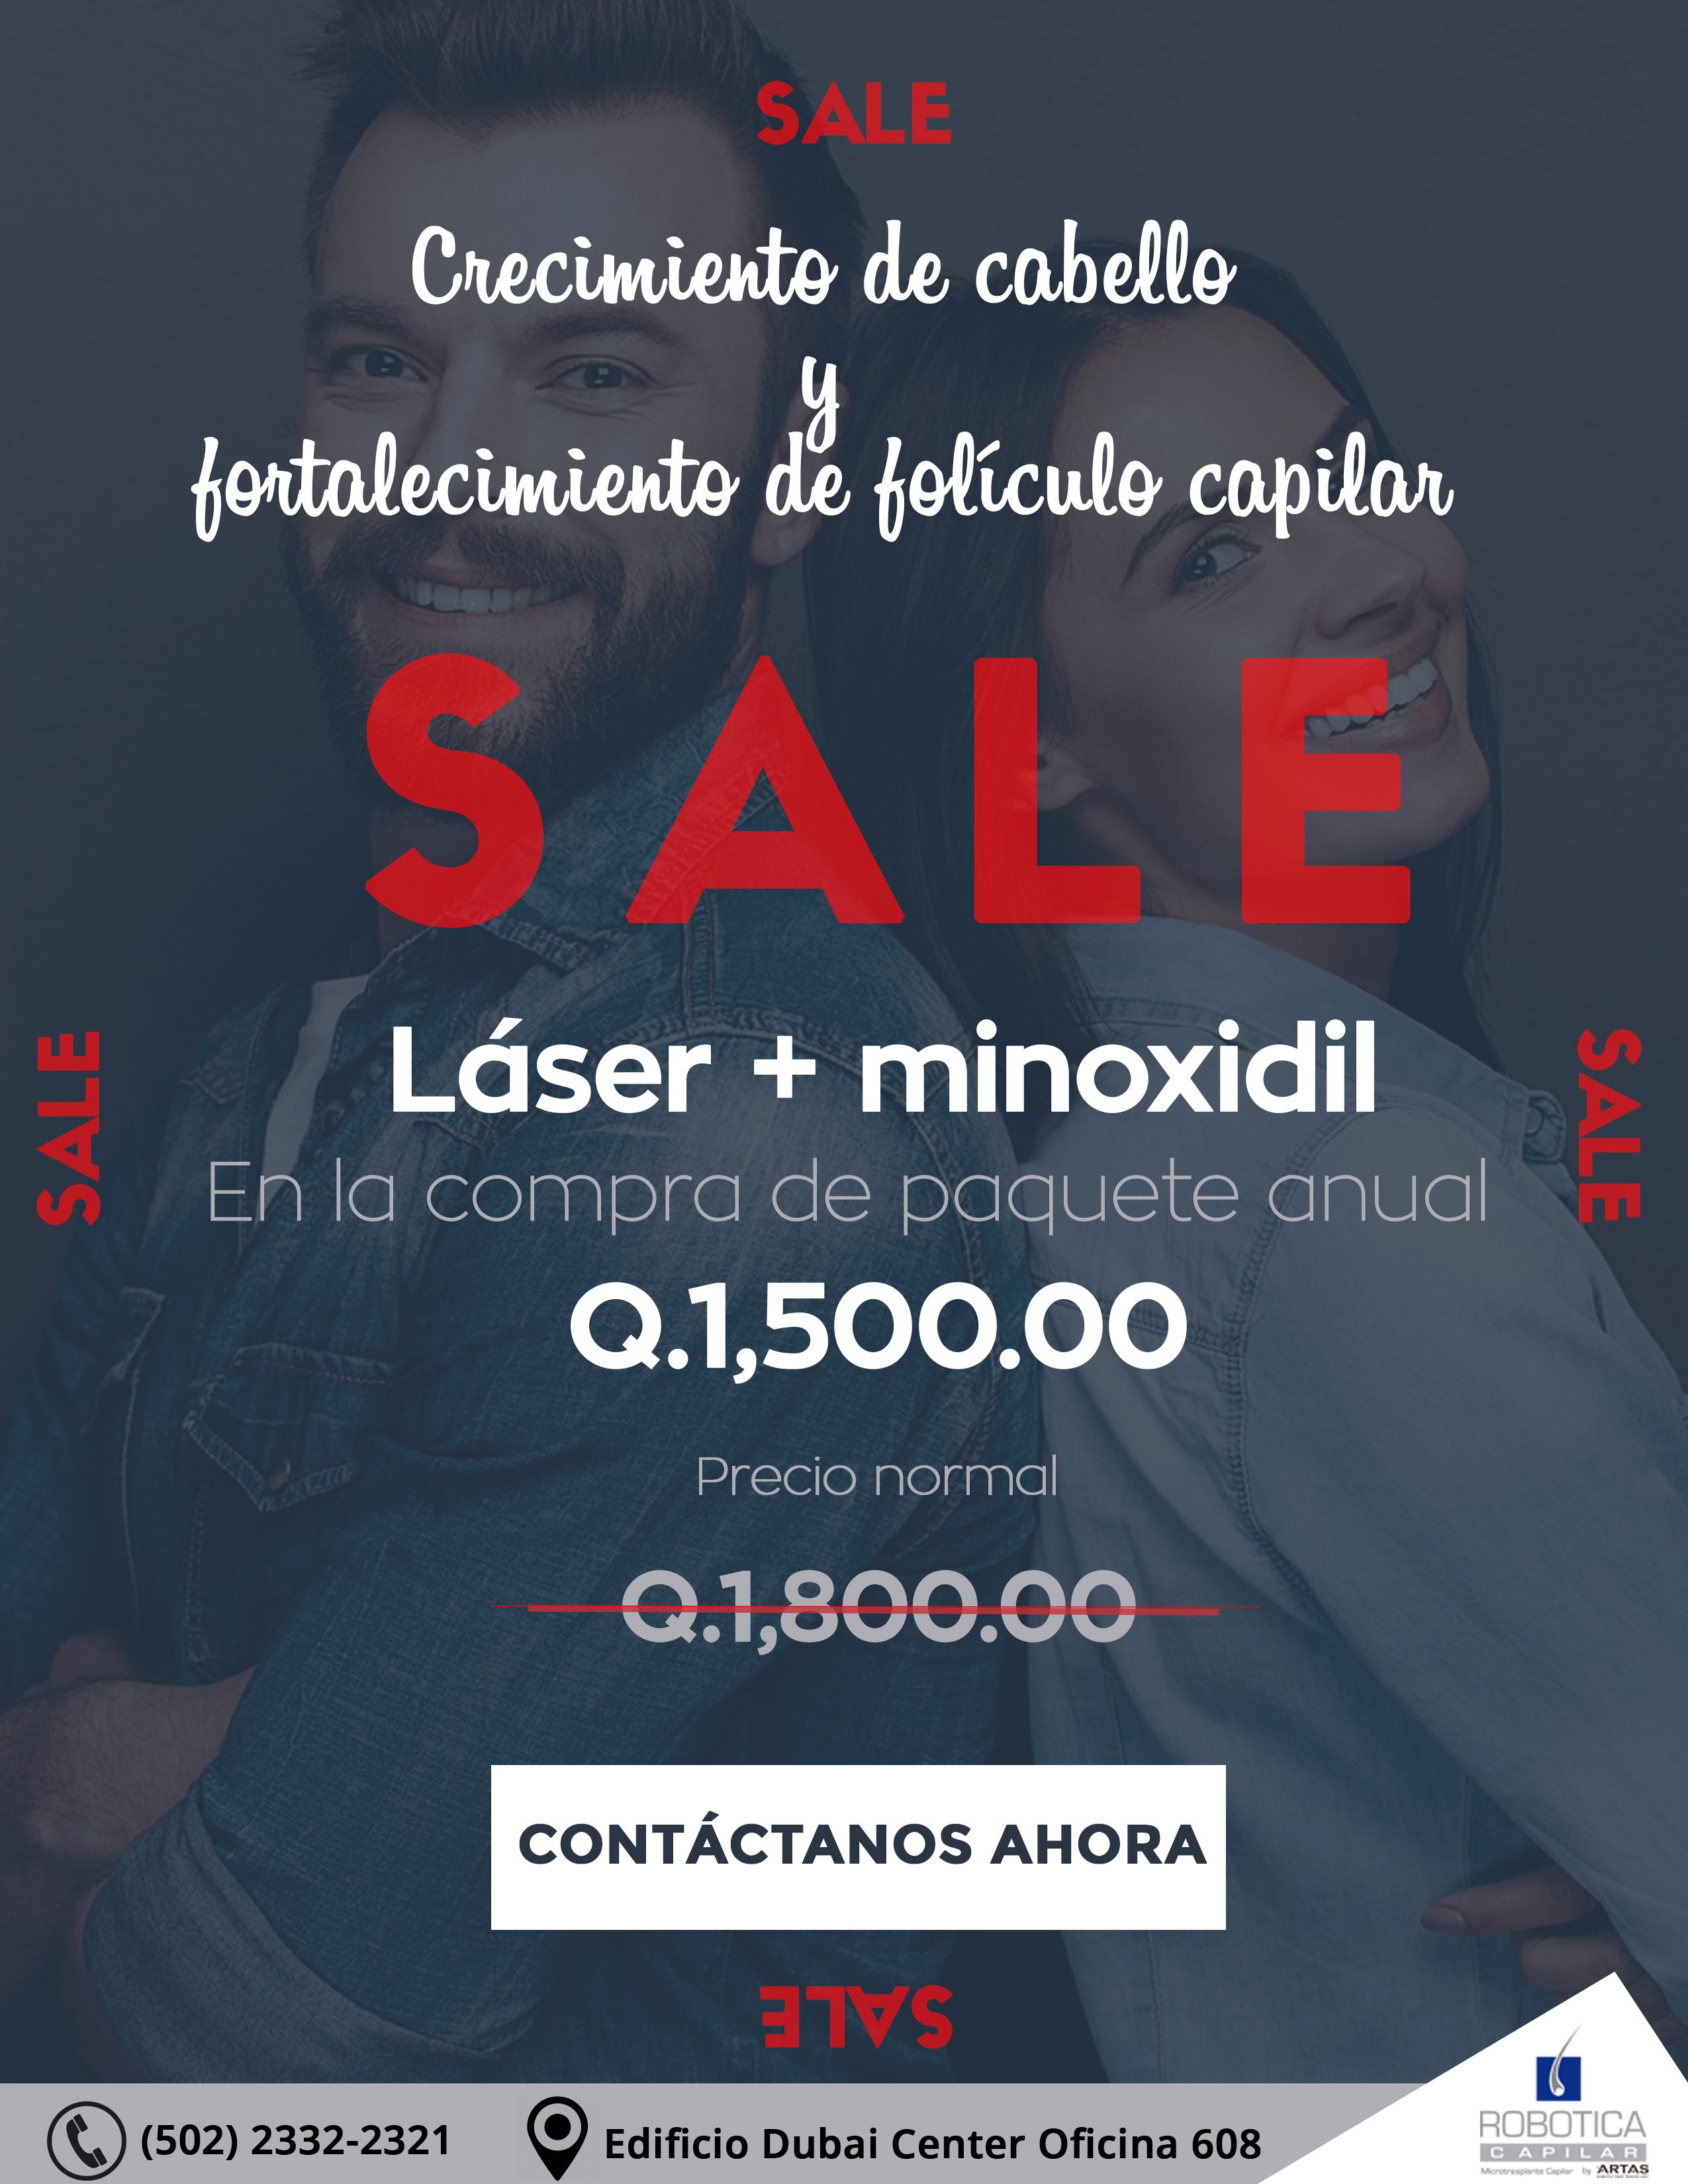 Laser + minoxidil anual